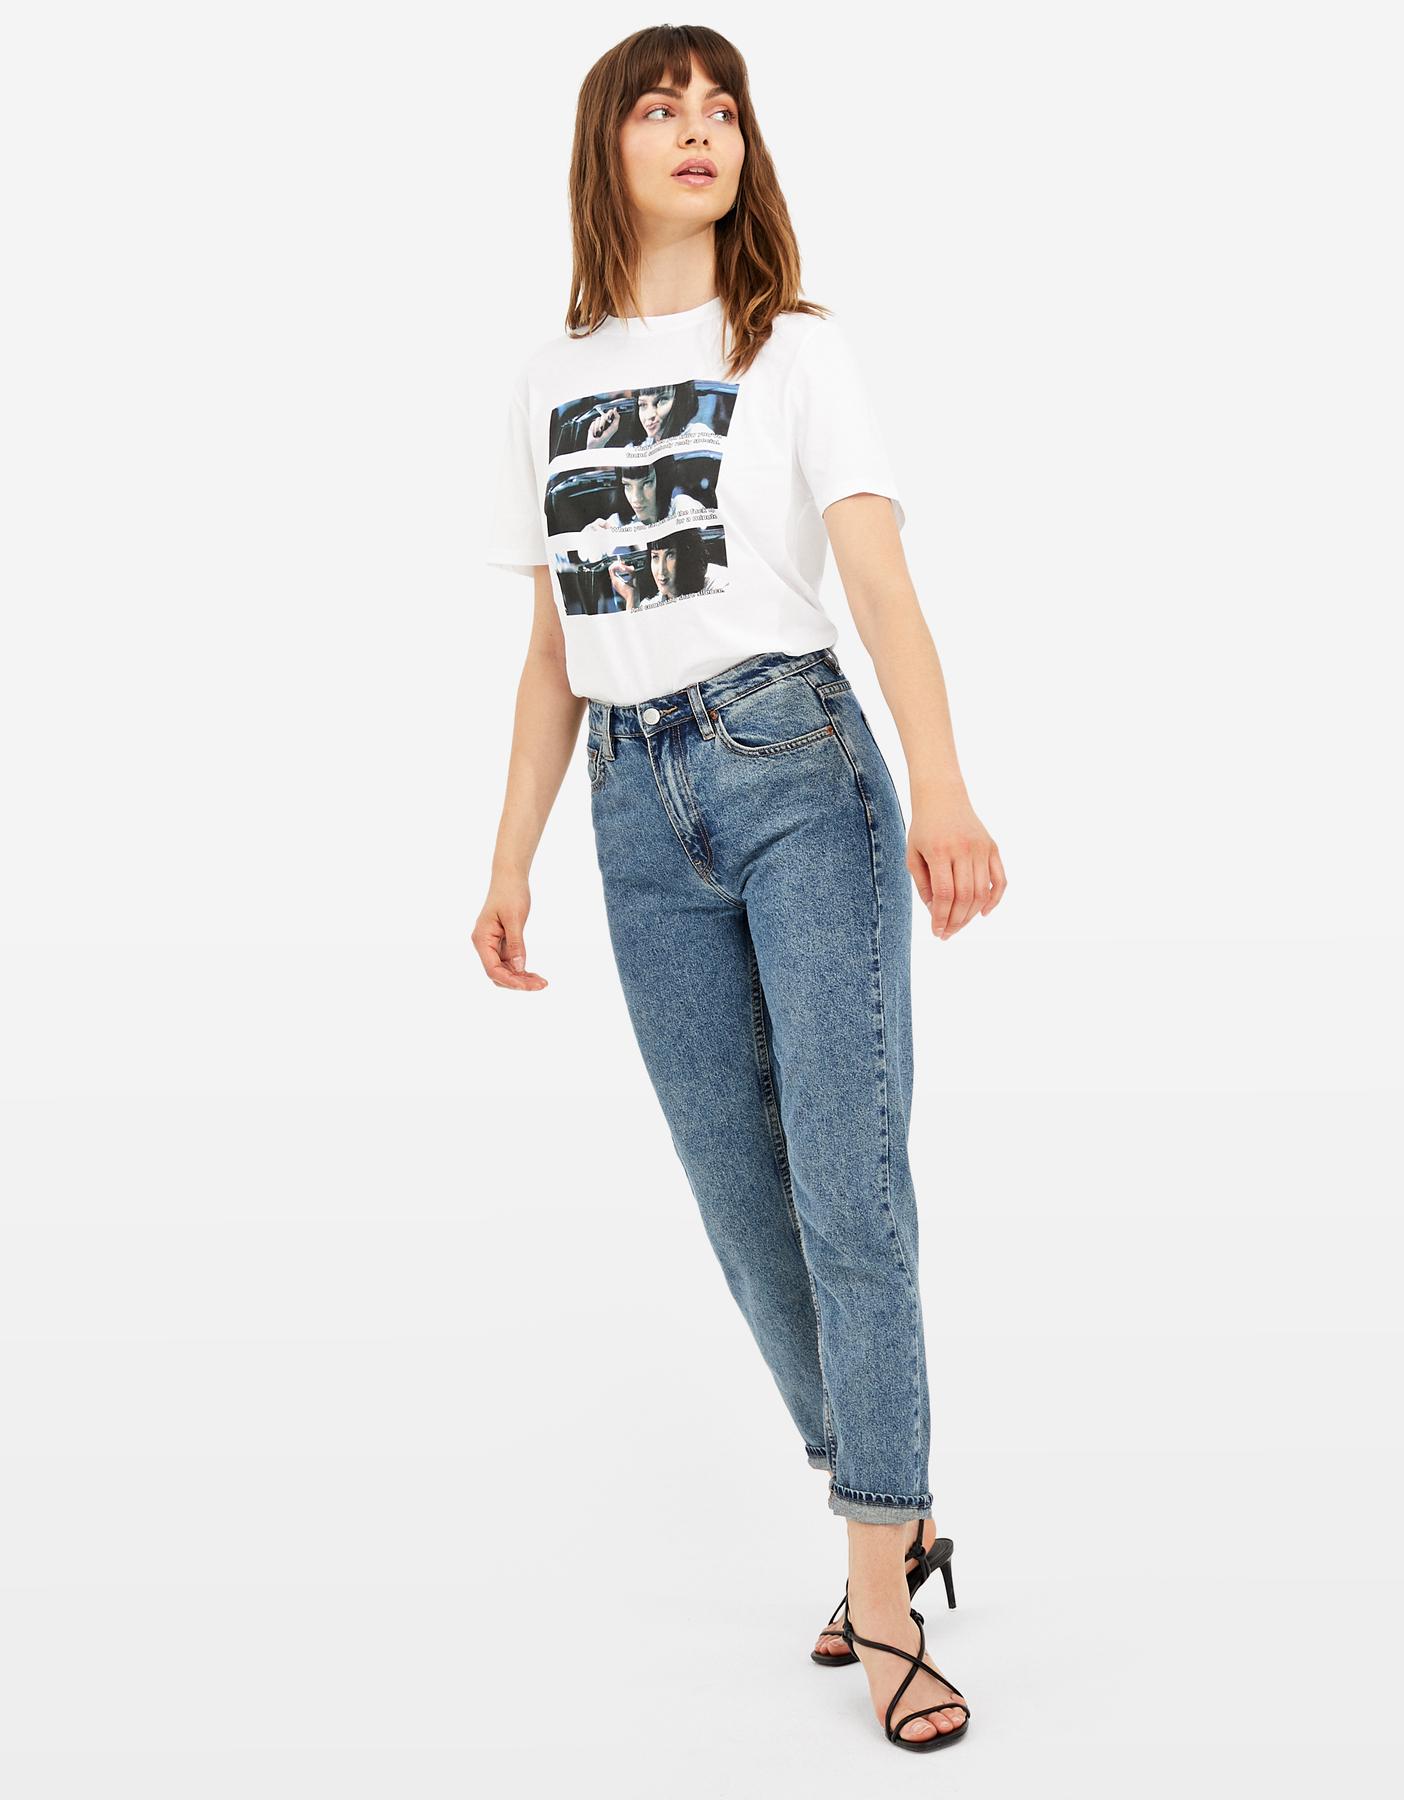 T-Shirt Blanc Pulp Fiction